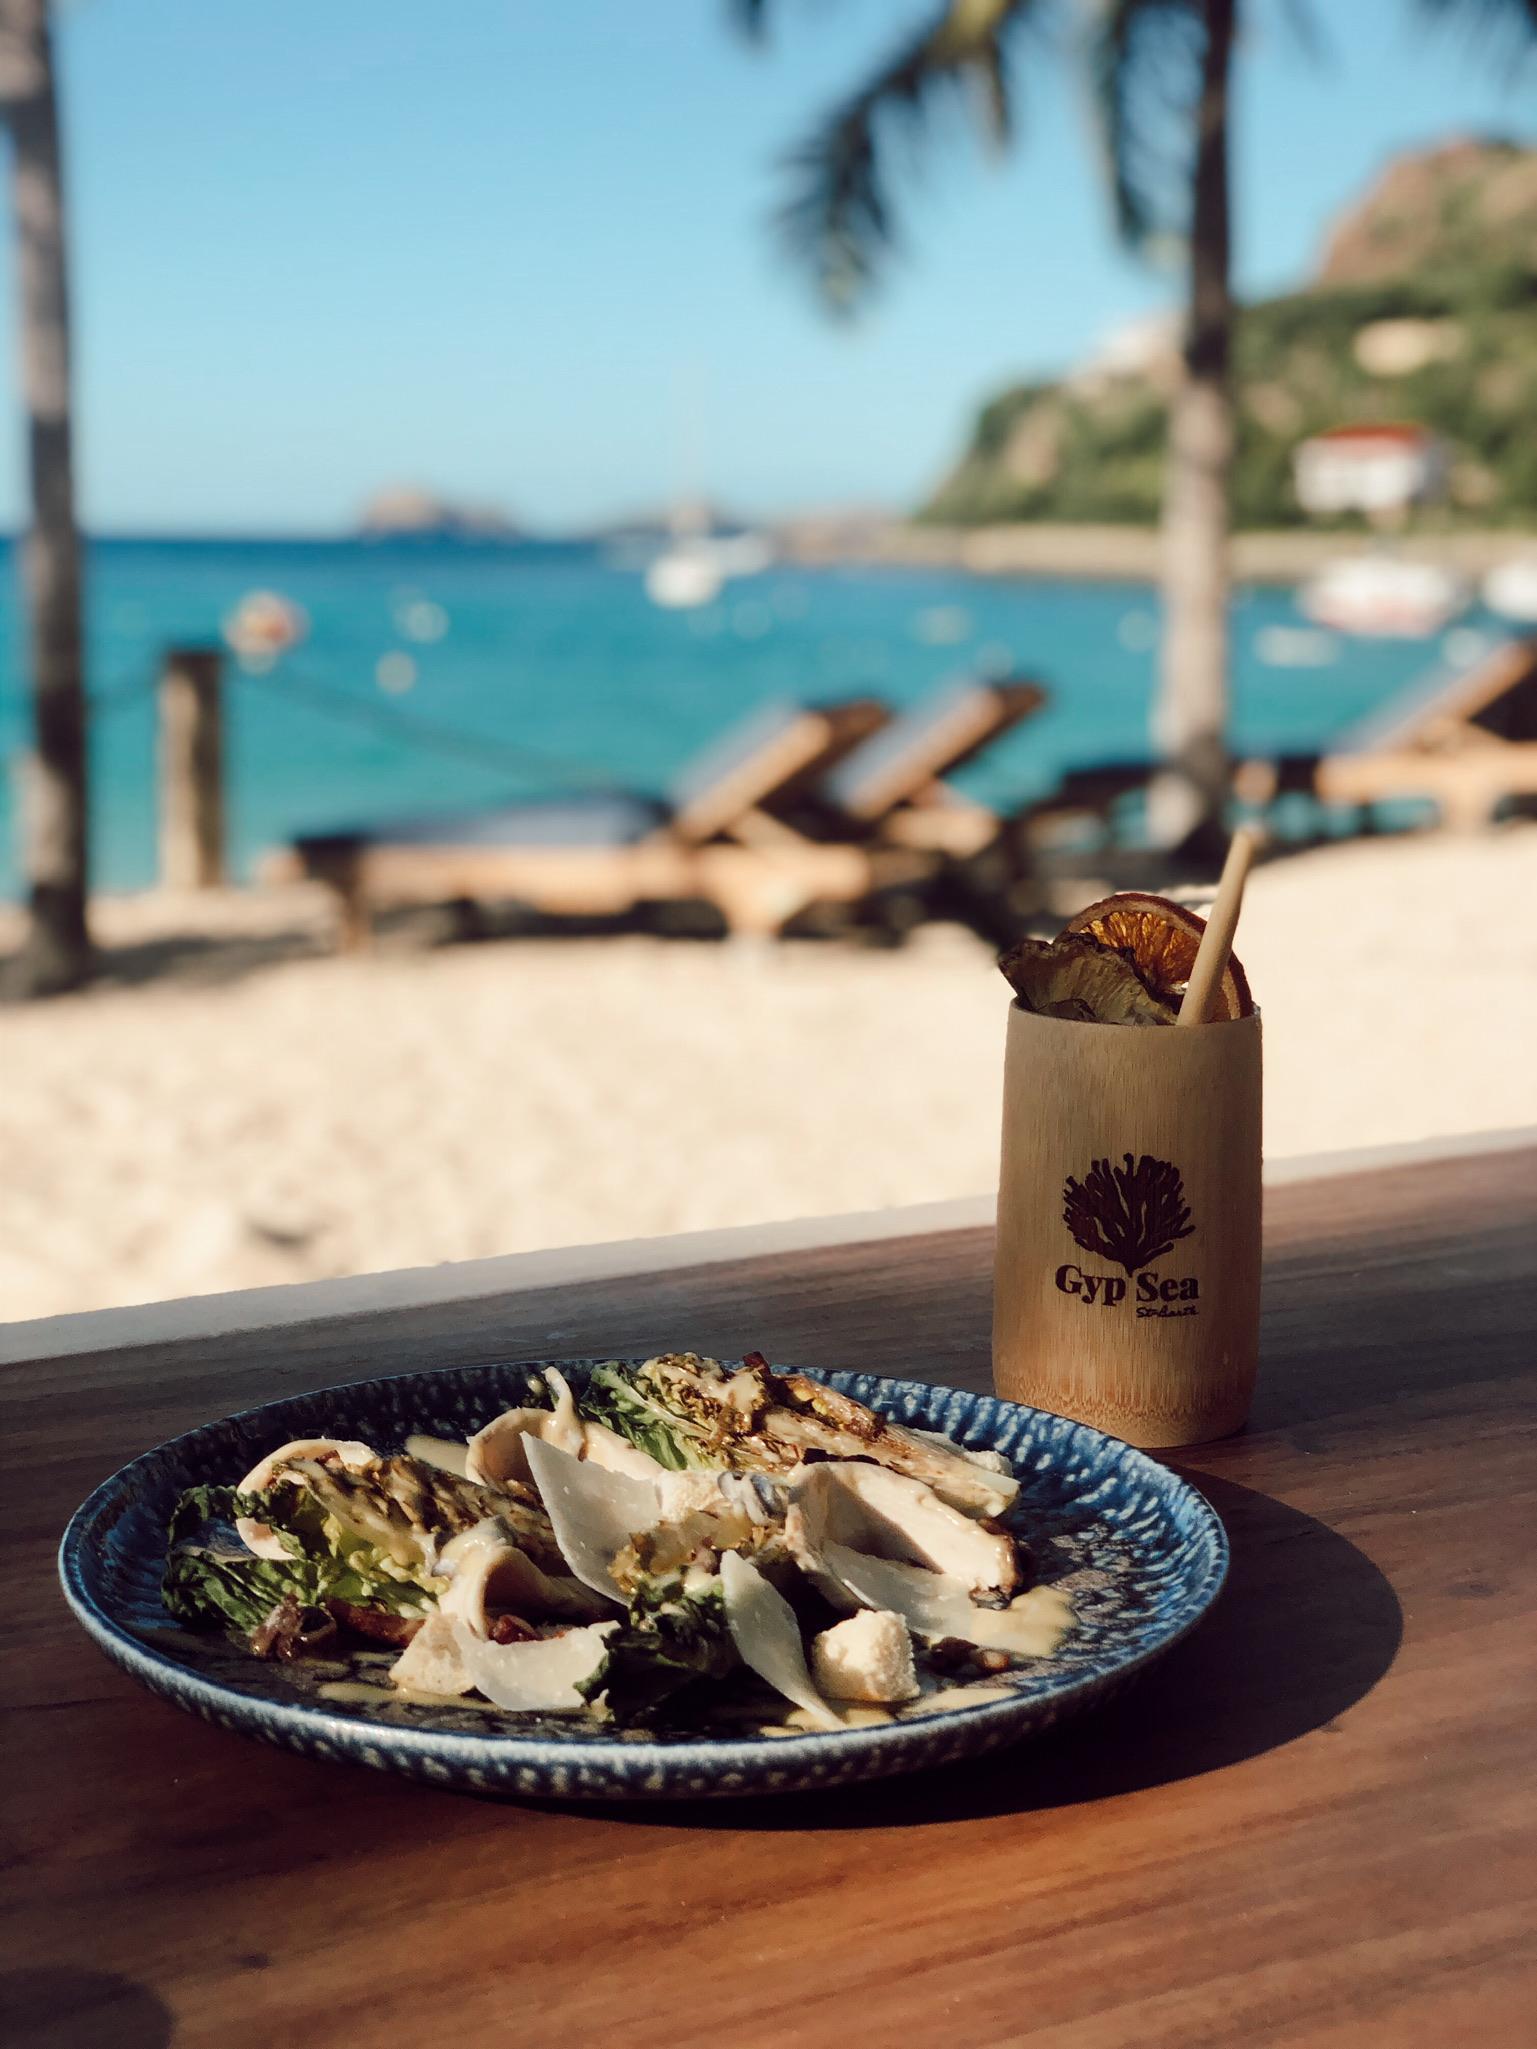 Lunch break Gyp Sea